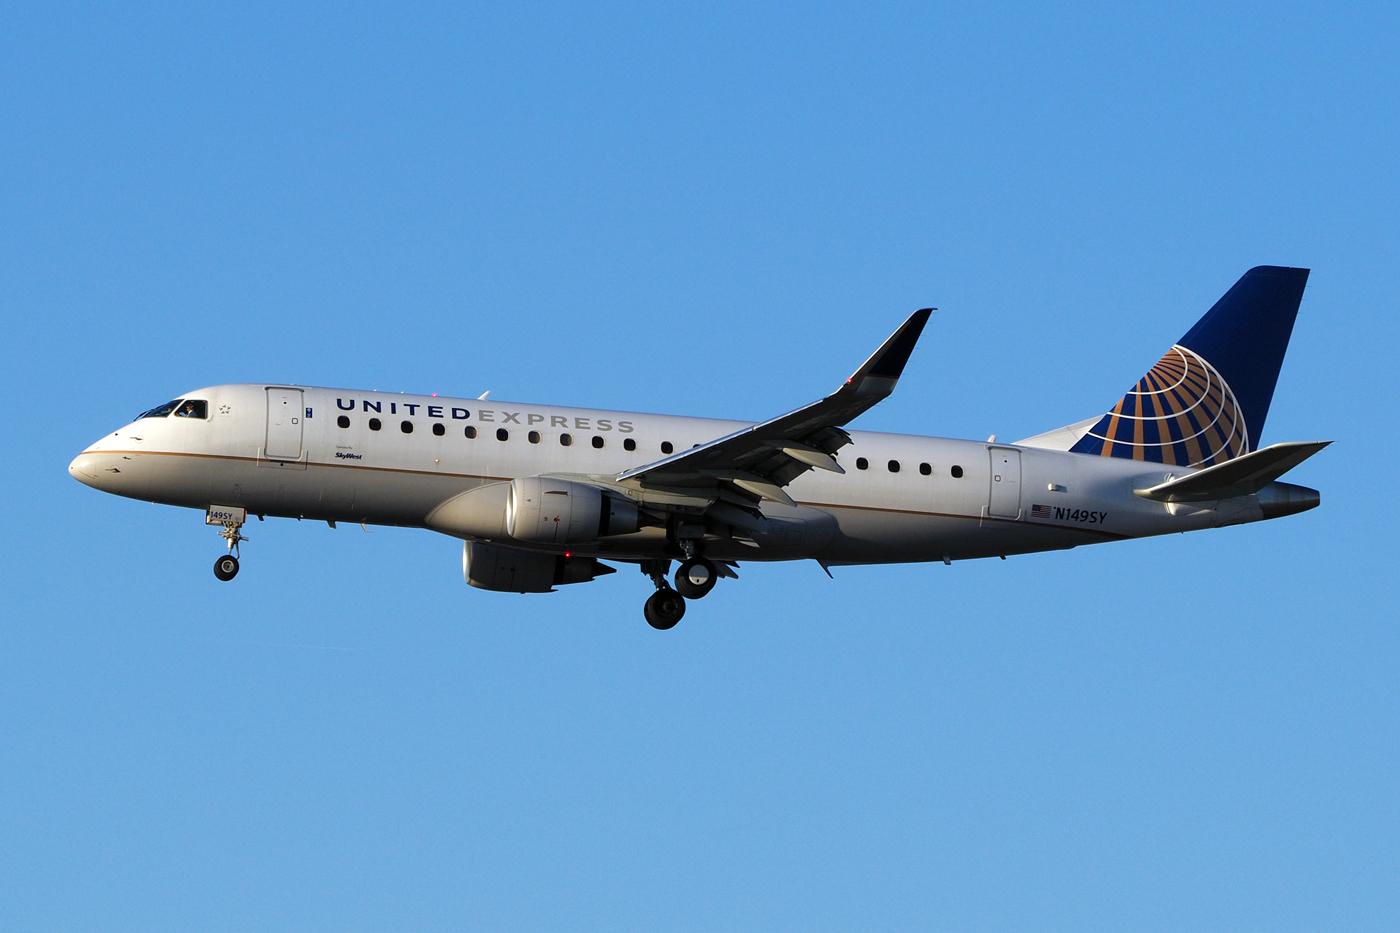 N149SY, United, Embraer 175